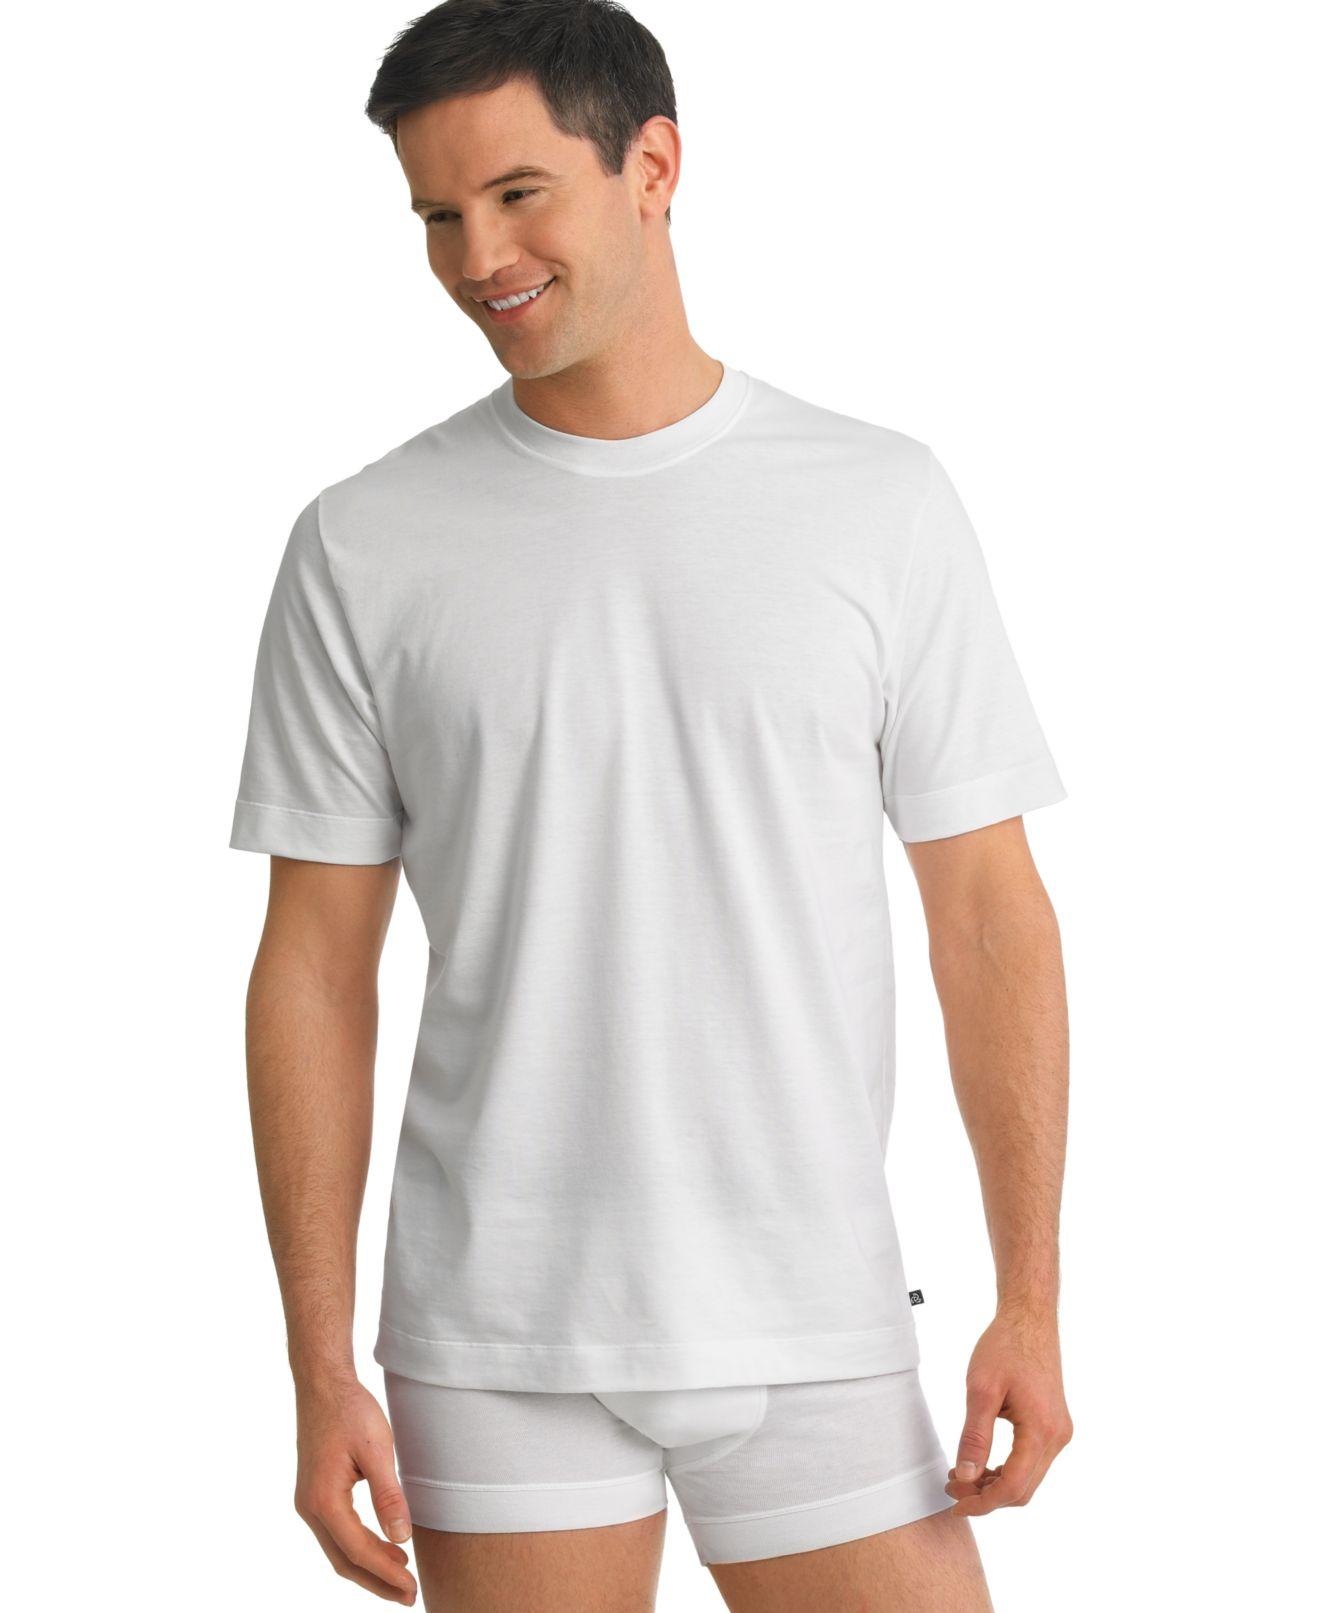 Crew Neck Under Dress Shirt Crew Neck 2 t Shirts Pack